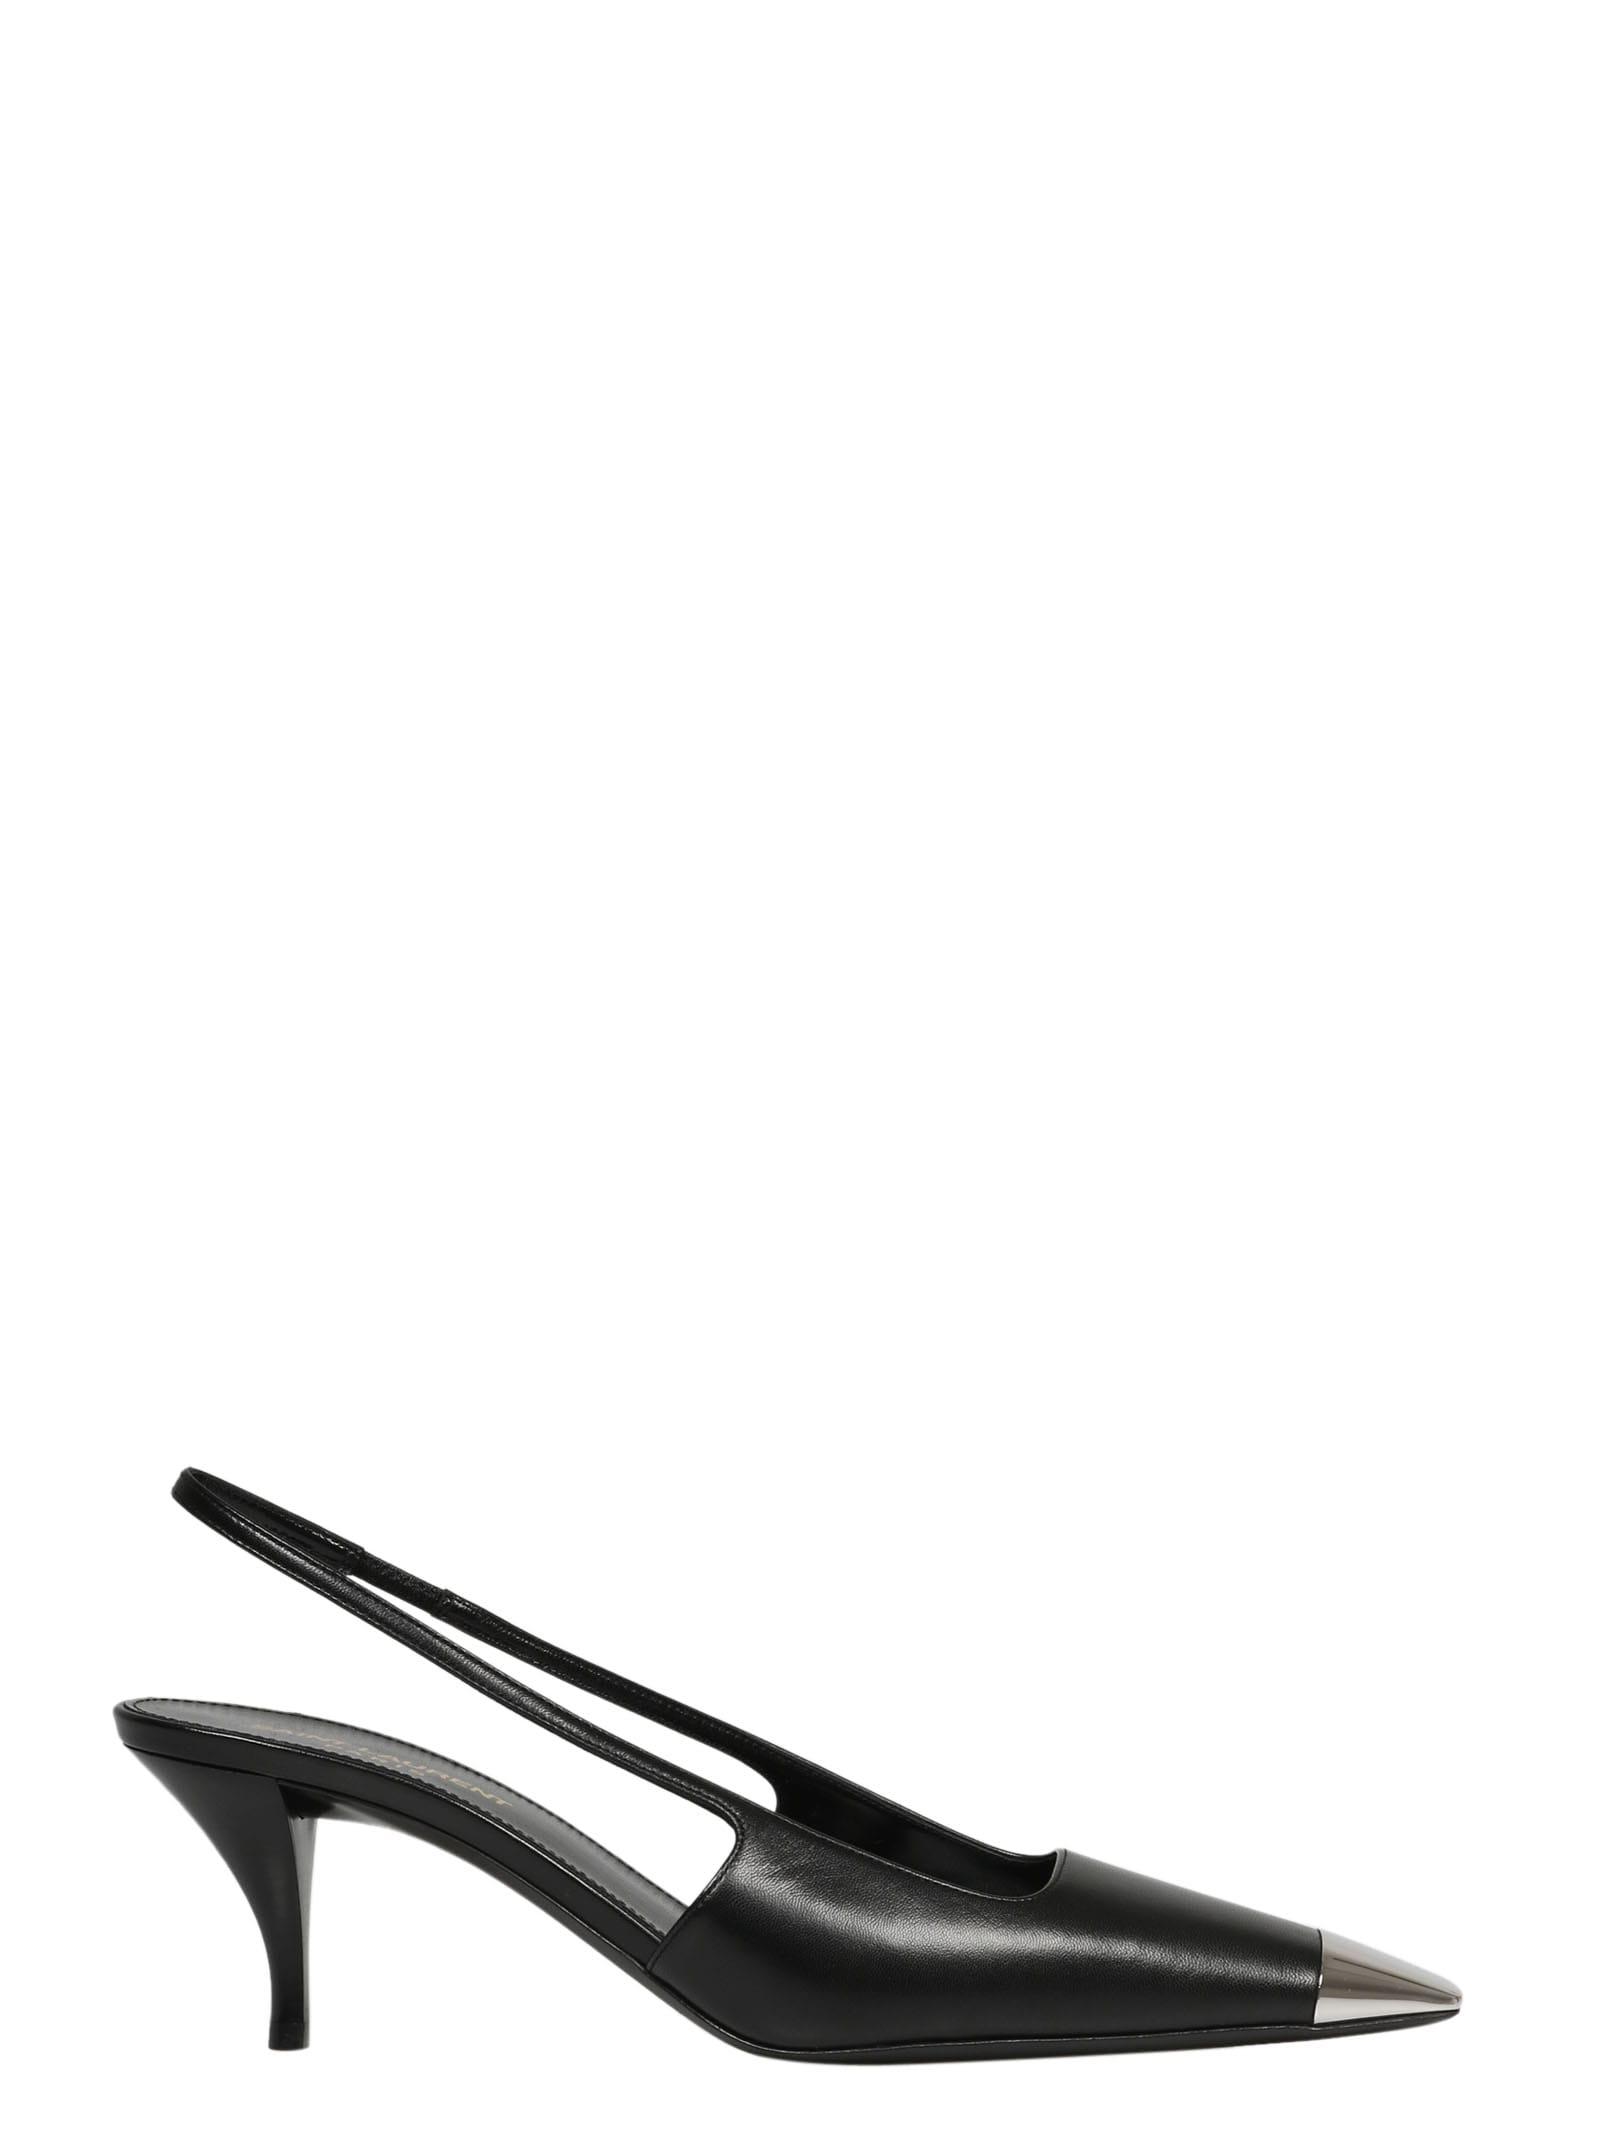 Saint Laurent Blade Slingback